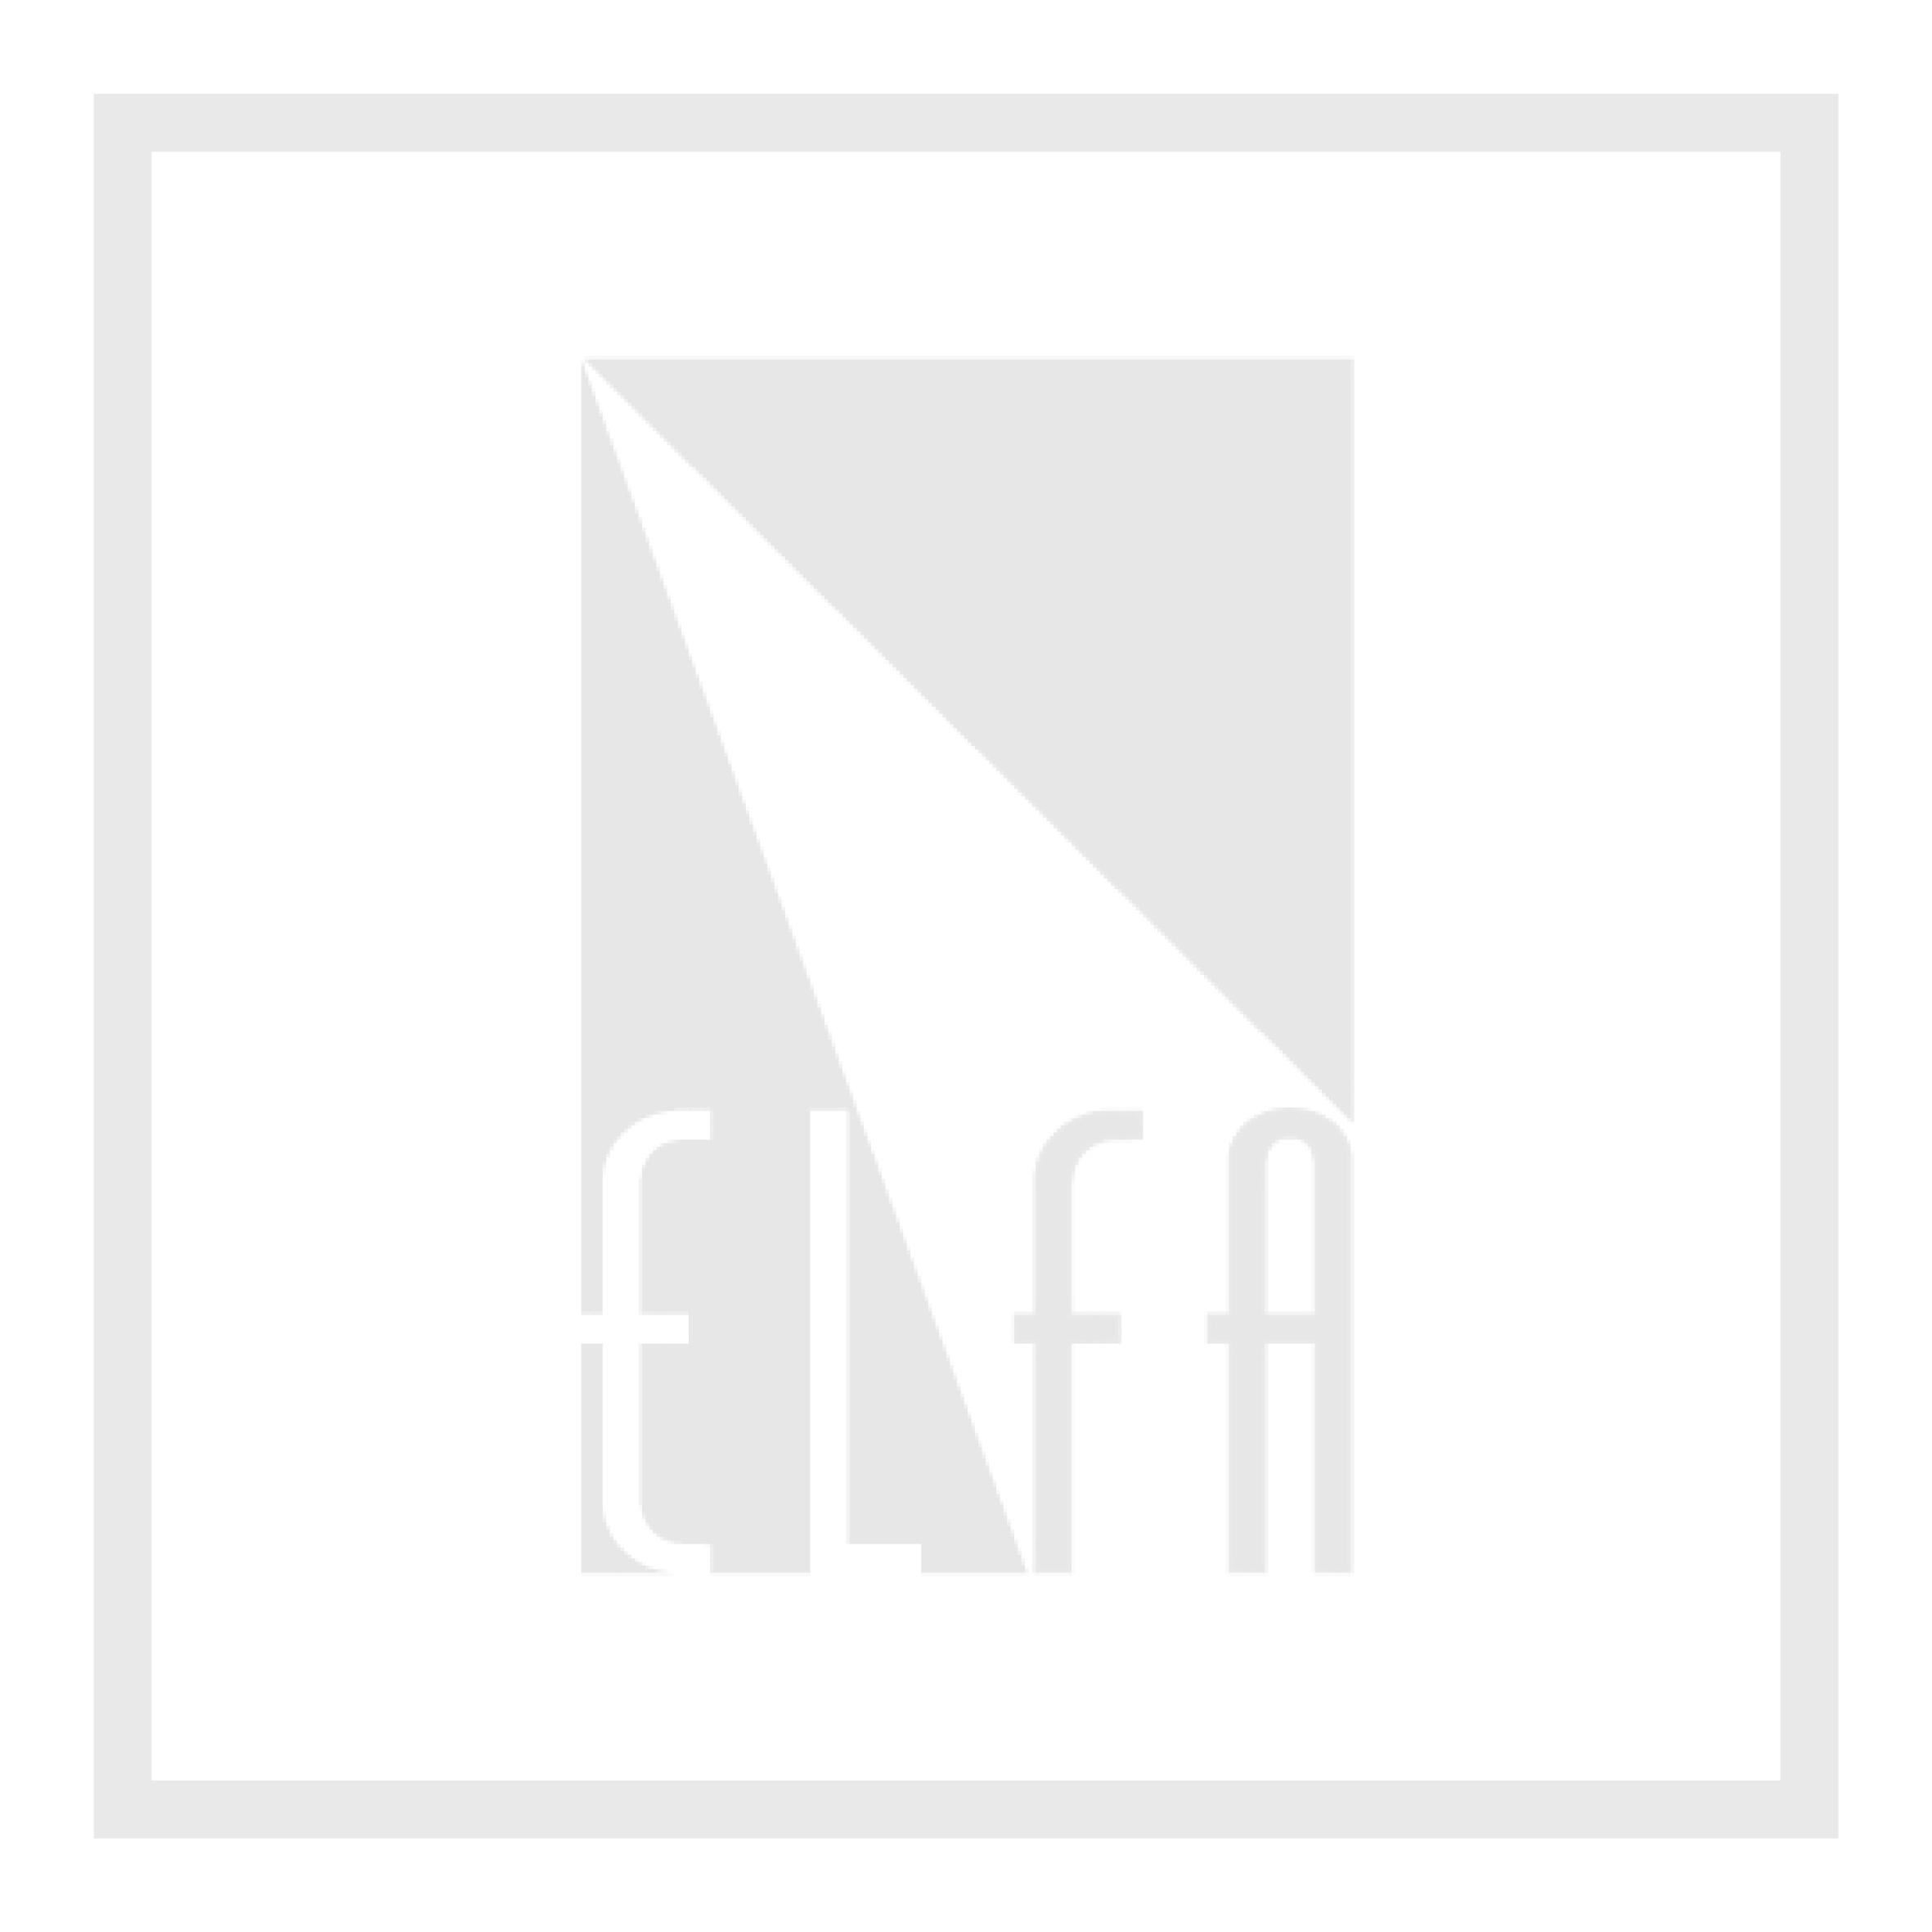 Renata Lithium knoopcel CR2016SM MFR 2LF 2016SM